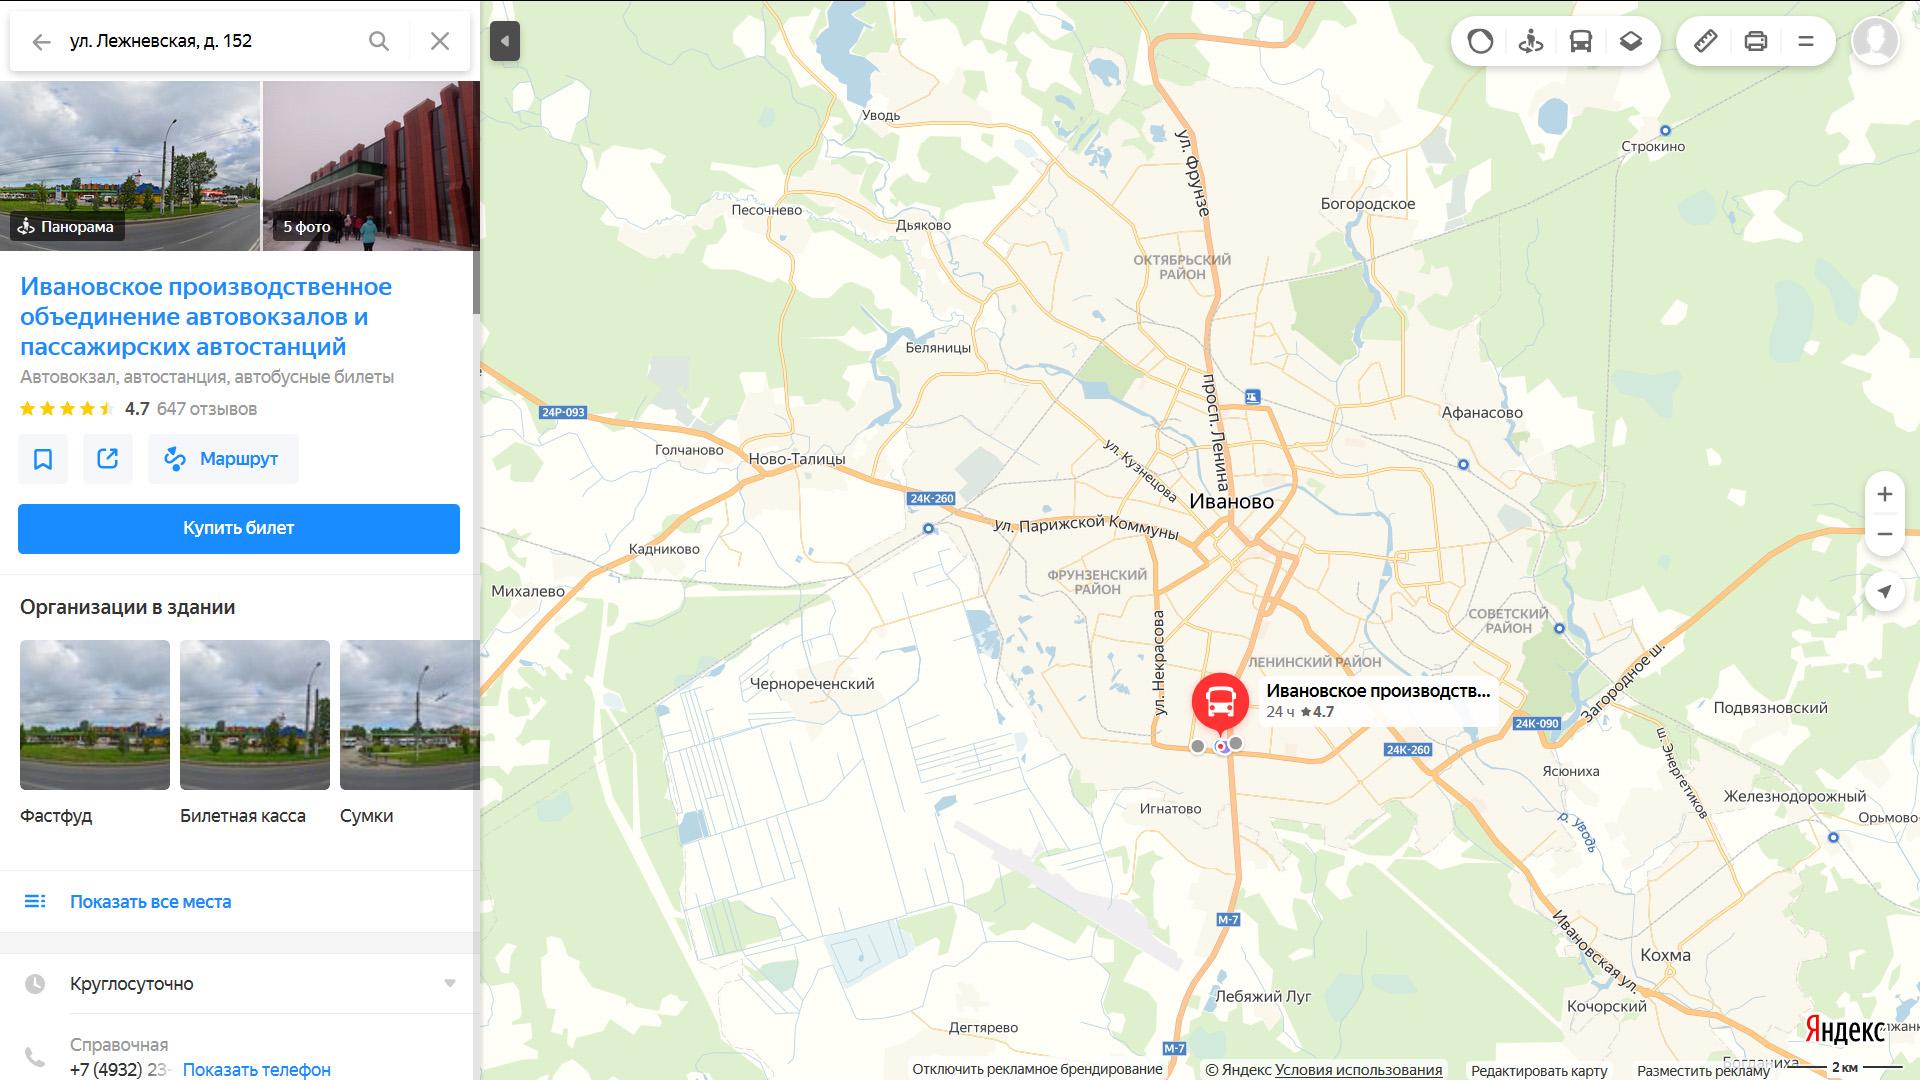 Автовокзал Иваново на карте